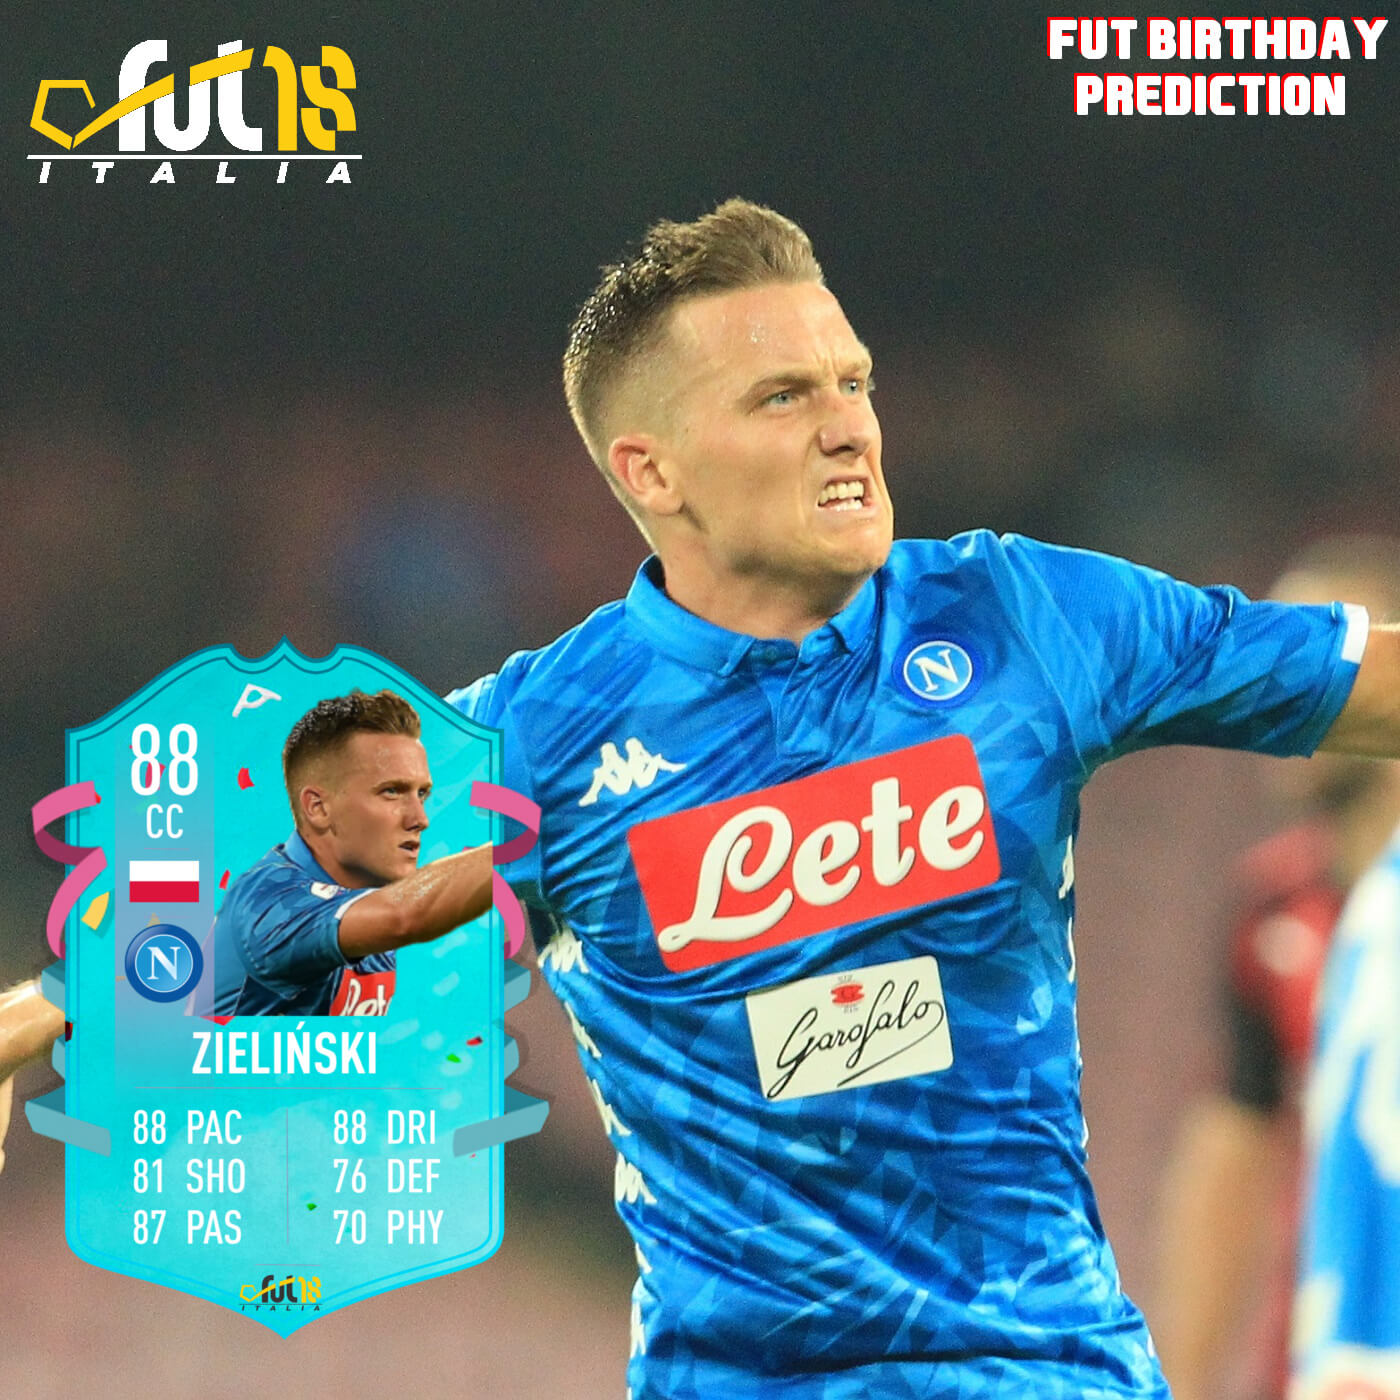 FIFA 20: Zielinski FUT birthday prediction